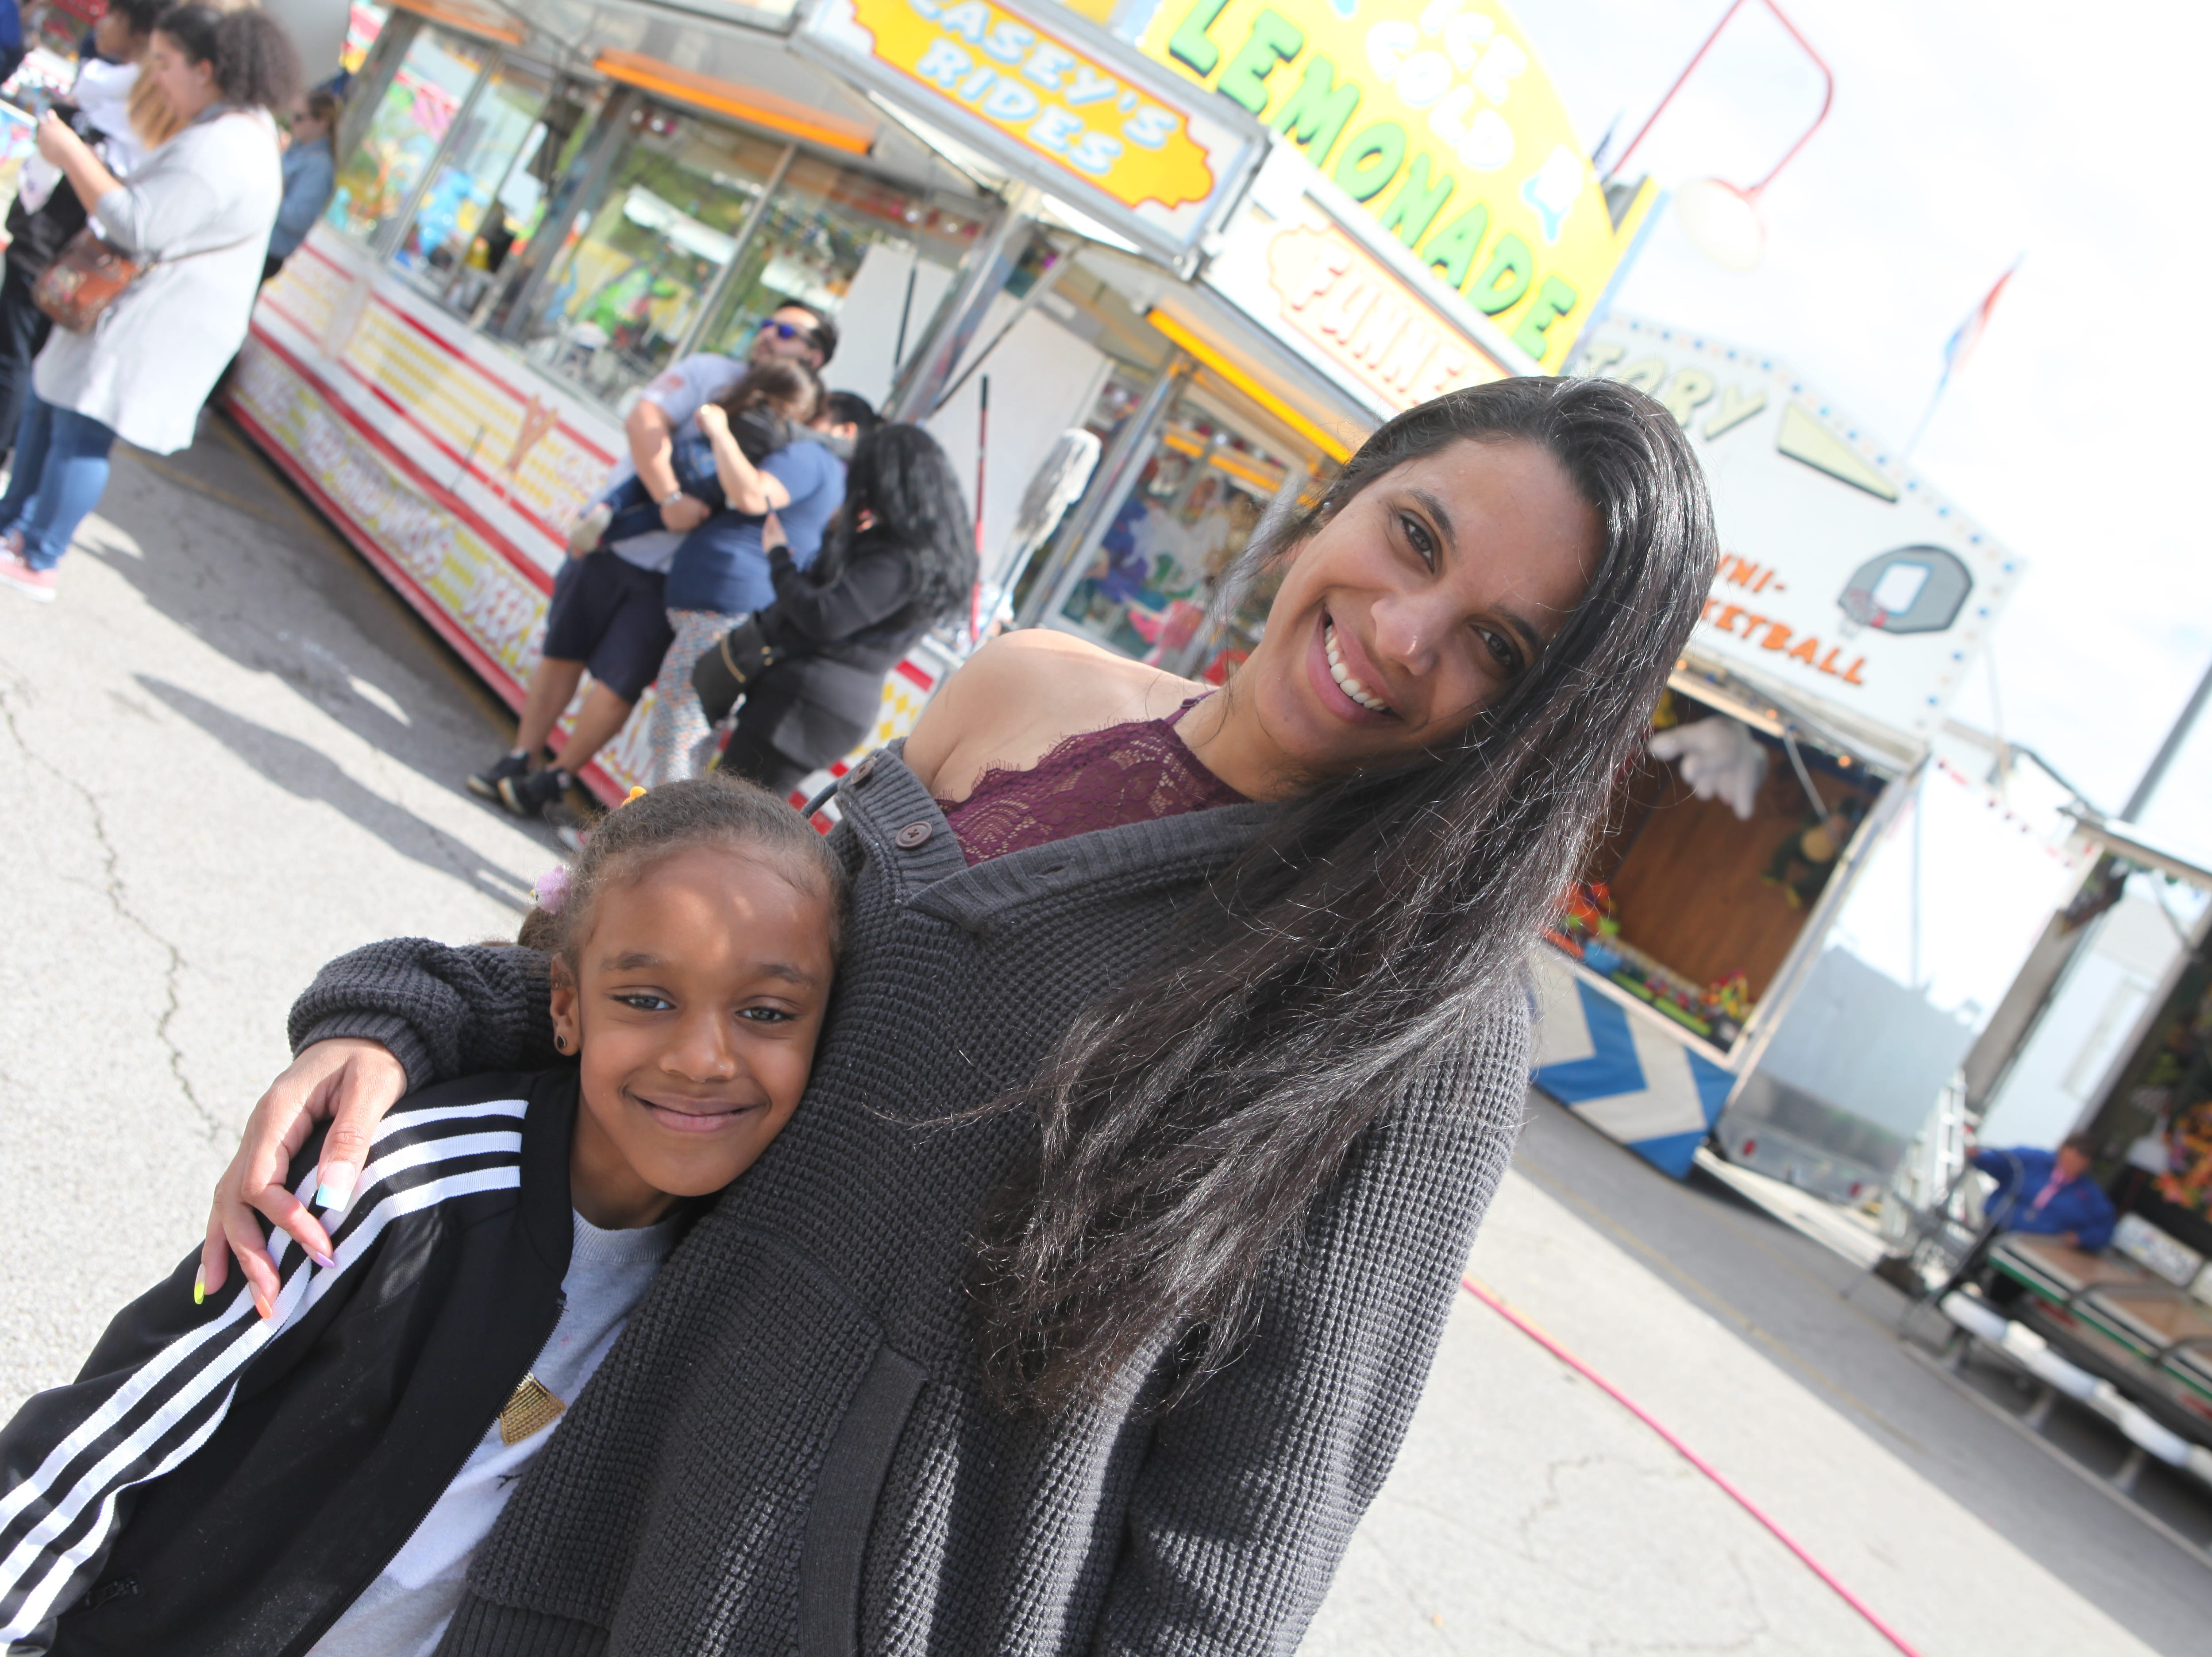 Valentina Gatling and Crystal Macklin at Governor's Square Mall's Spring Carnival on Saturday, April 20, 2019.